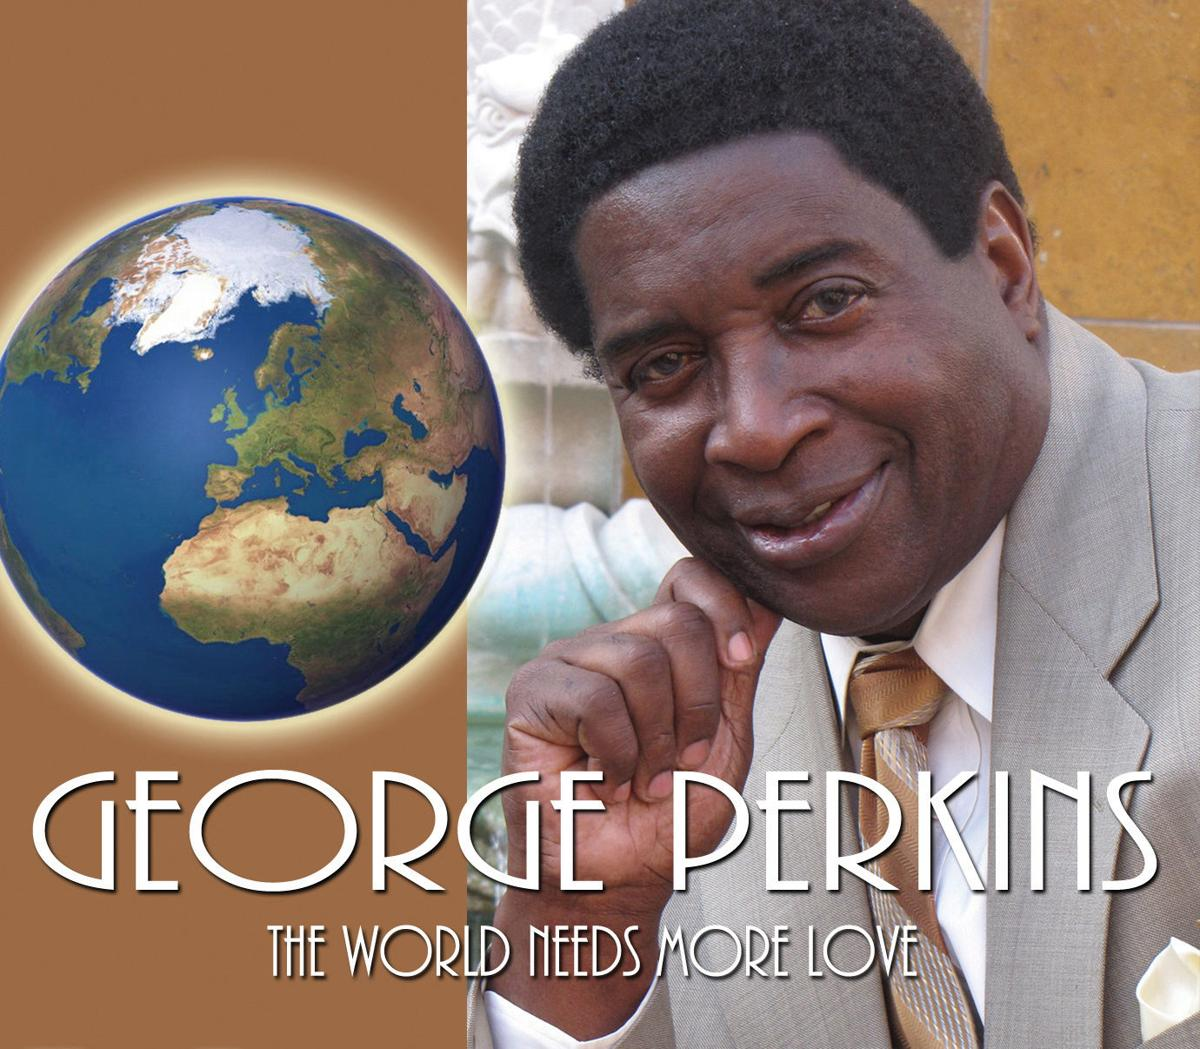 Gospel Explosion : George Perkins